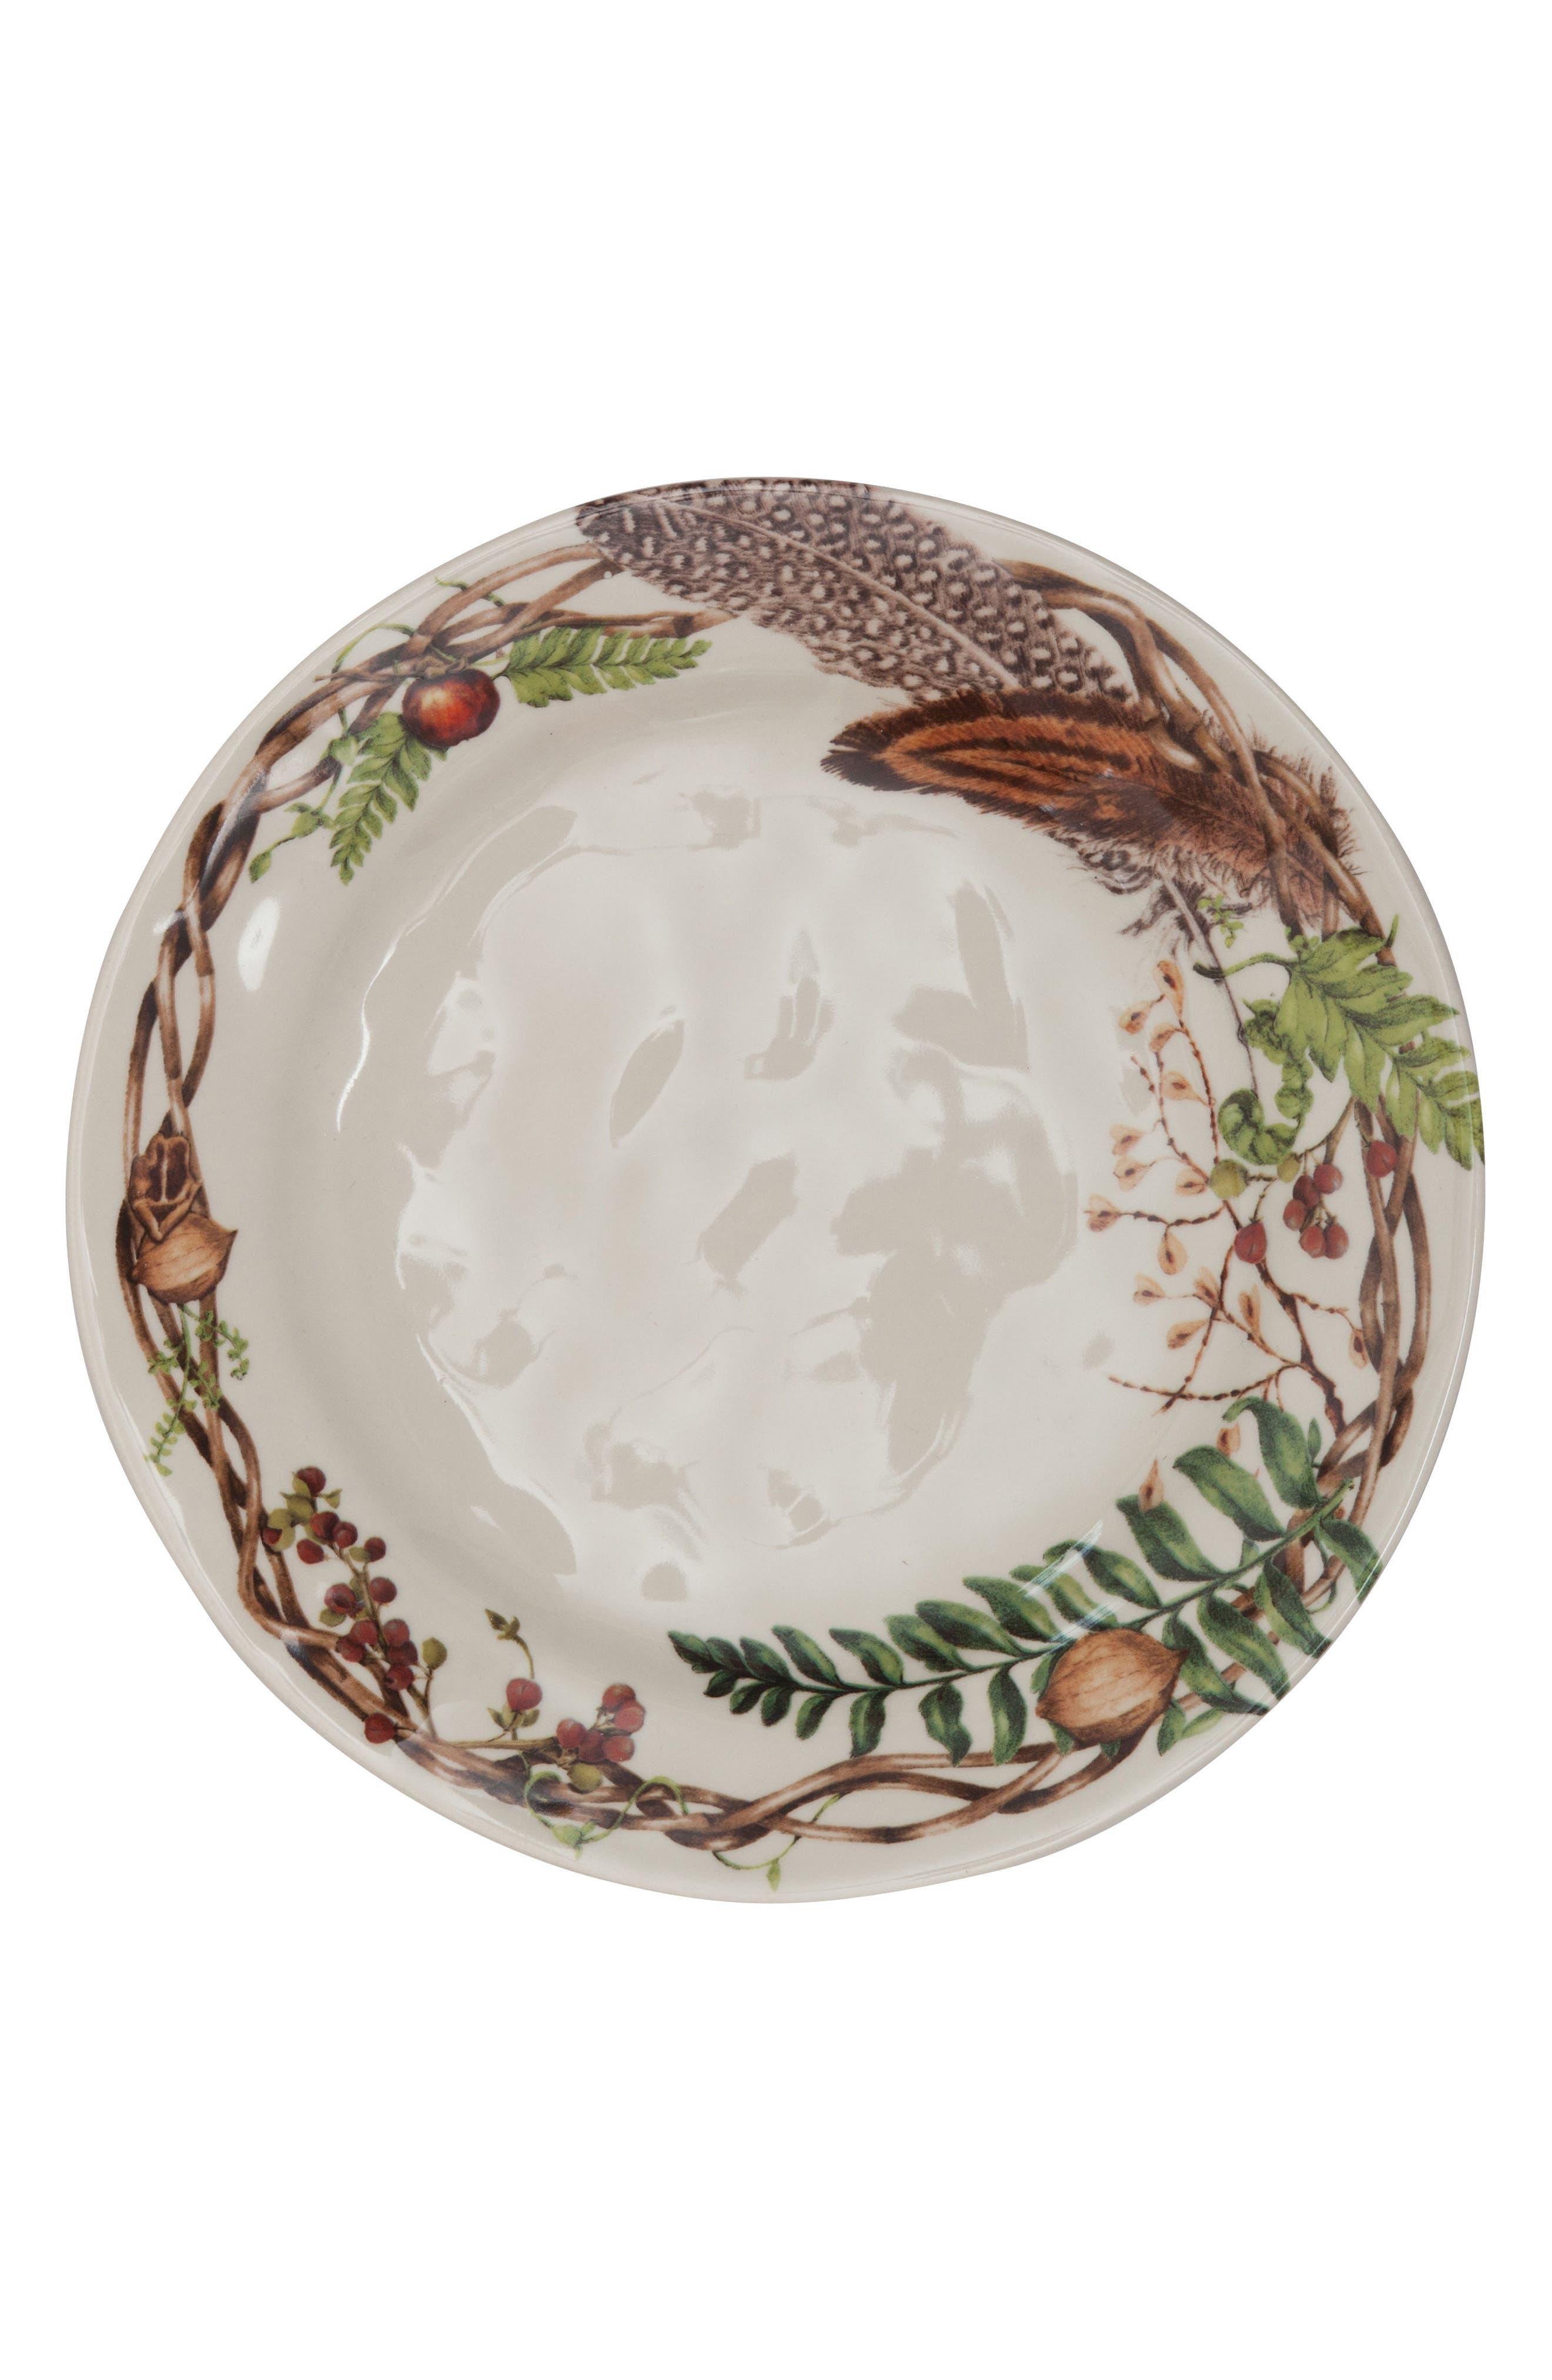 Forest Walk Dinner Plate,                             Alternate thumbnail 2, color,                             CAF AU LAIT